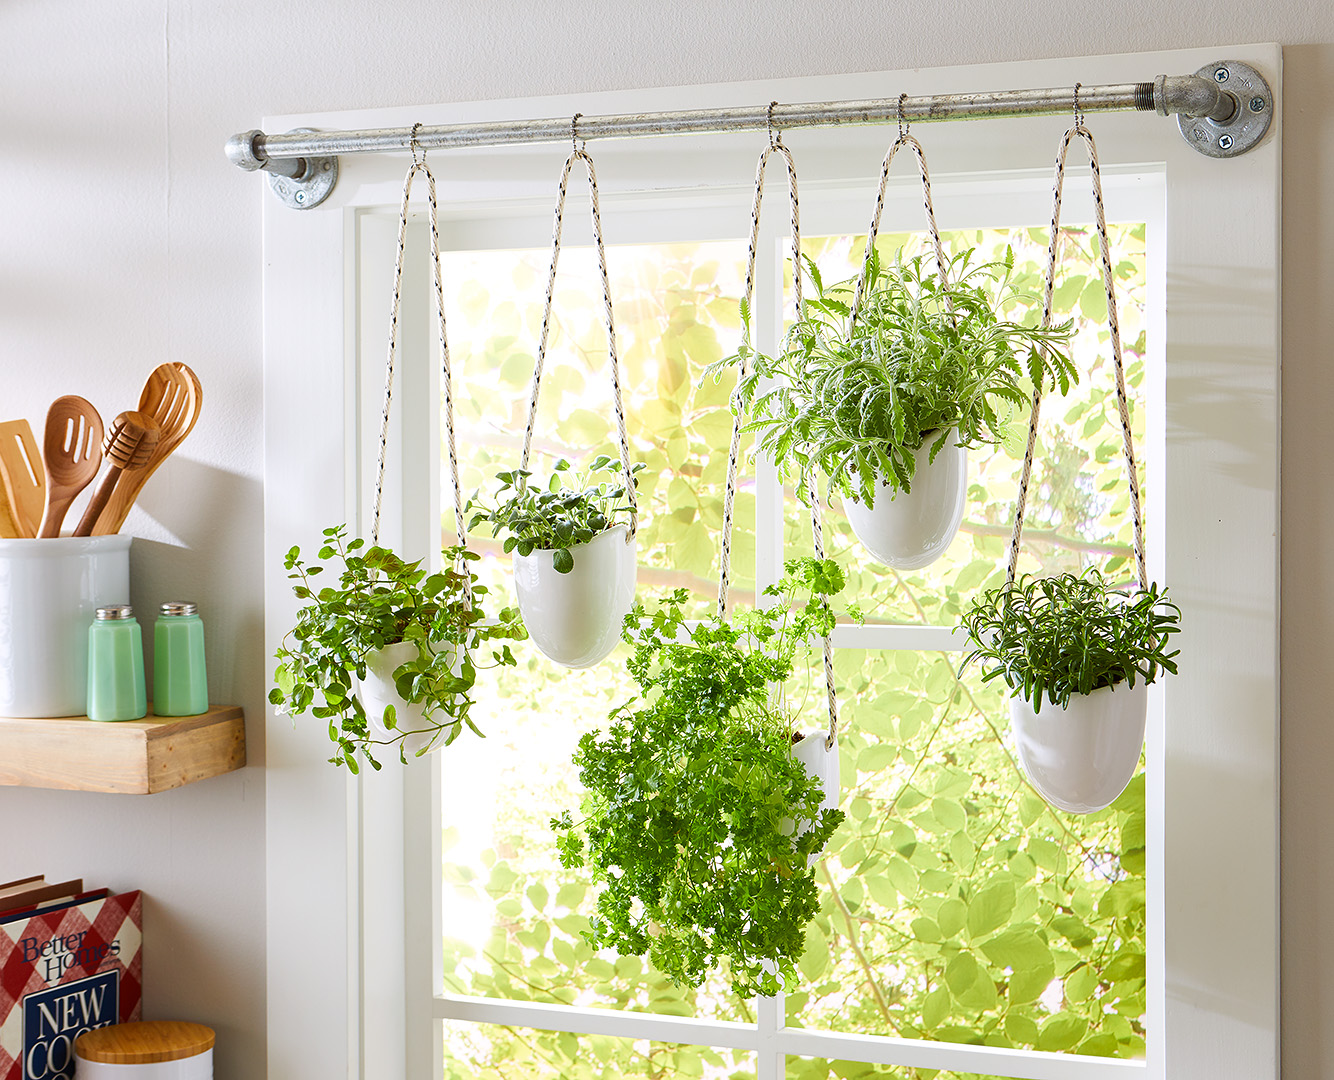 Hanging Window Planter